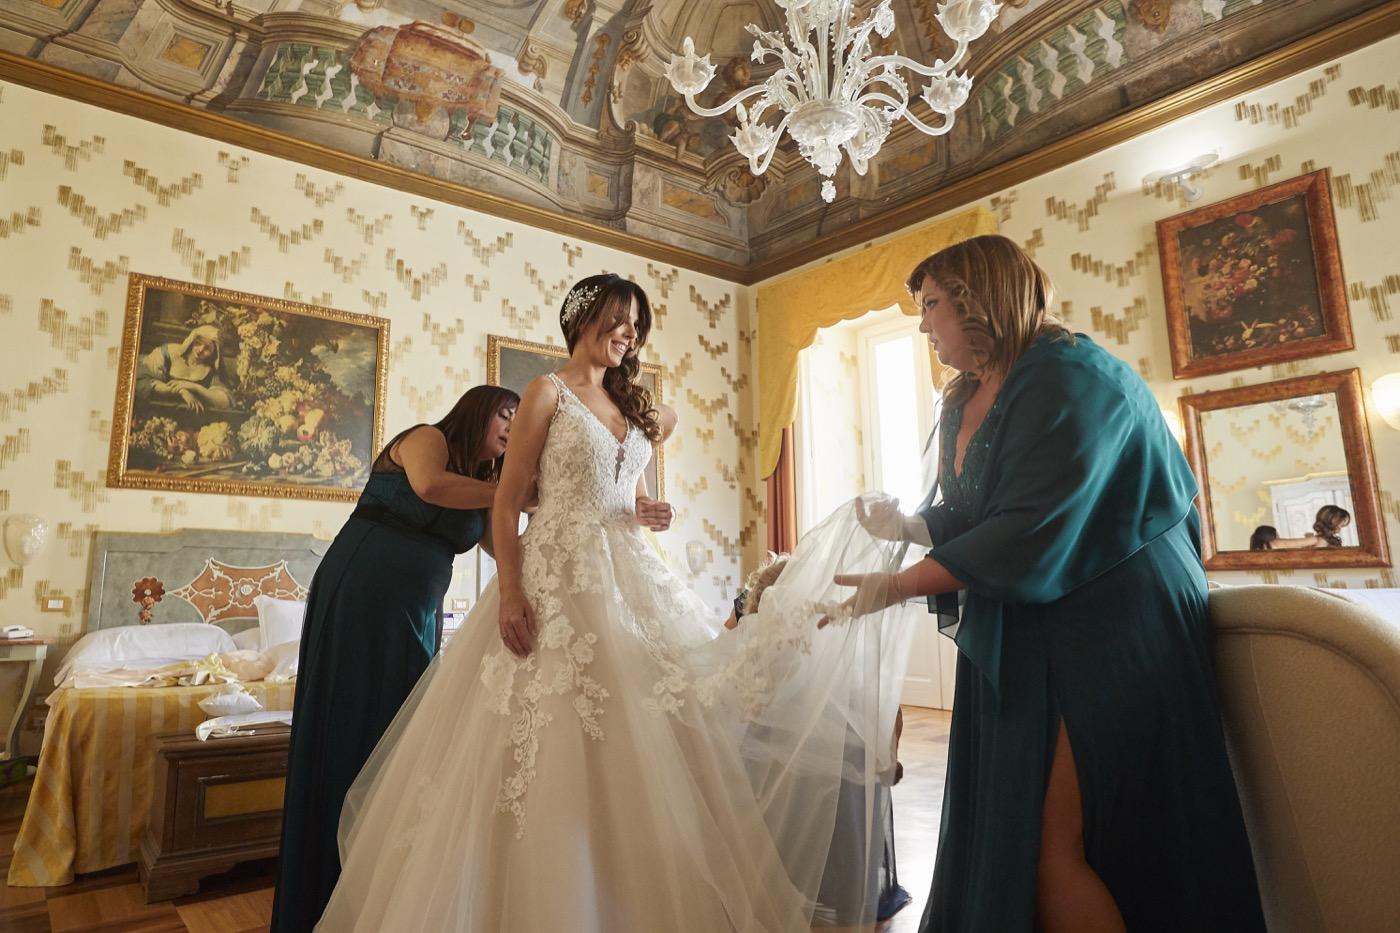 Claudio-Coppola-wedding-photographer-la-scuderia-eventi-preparativi-la-rosetta-perugia-19